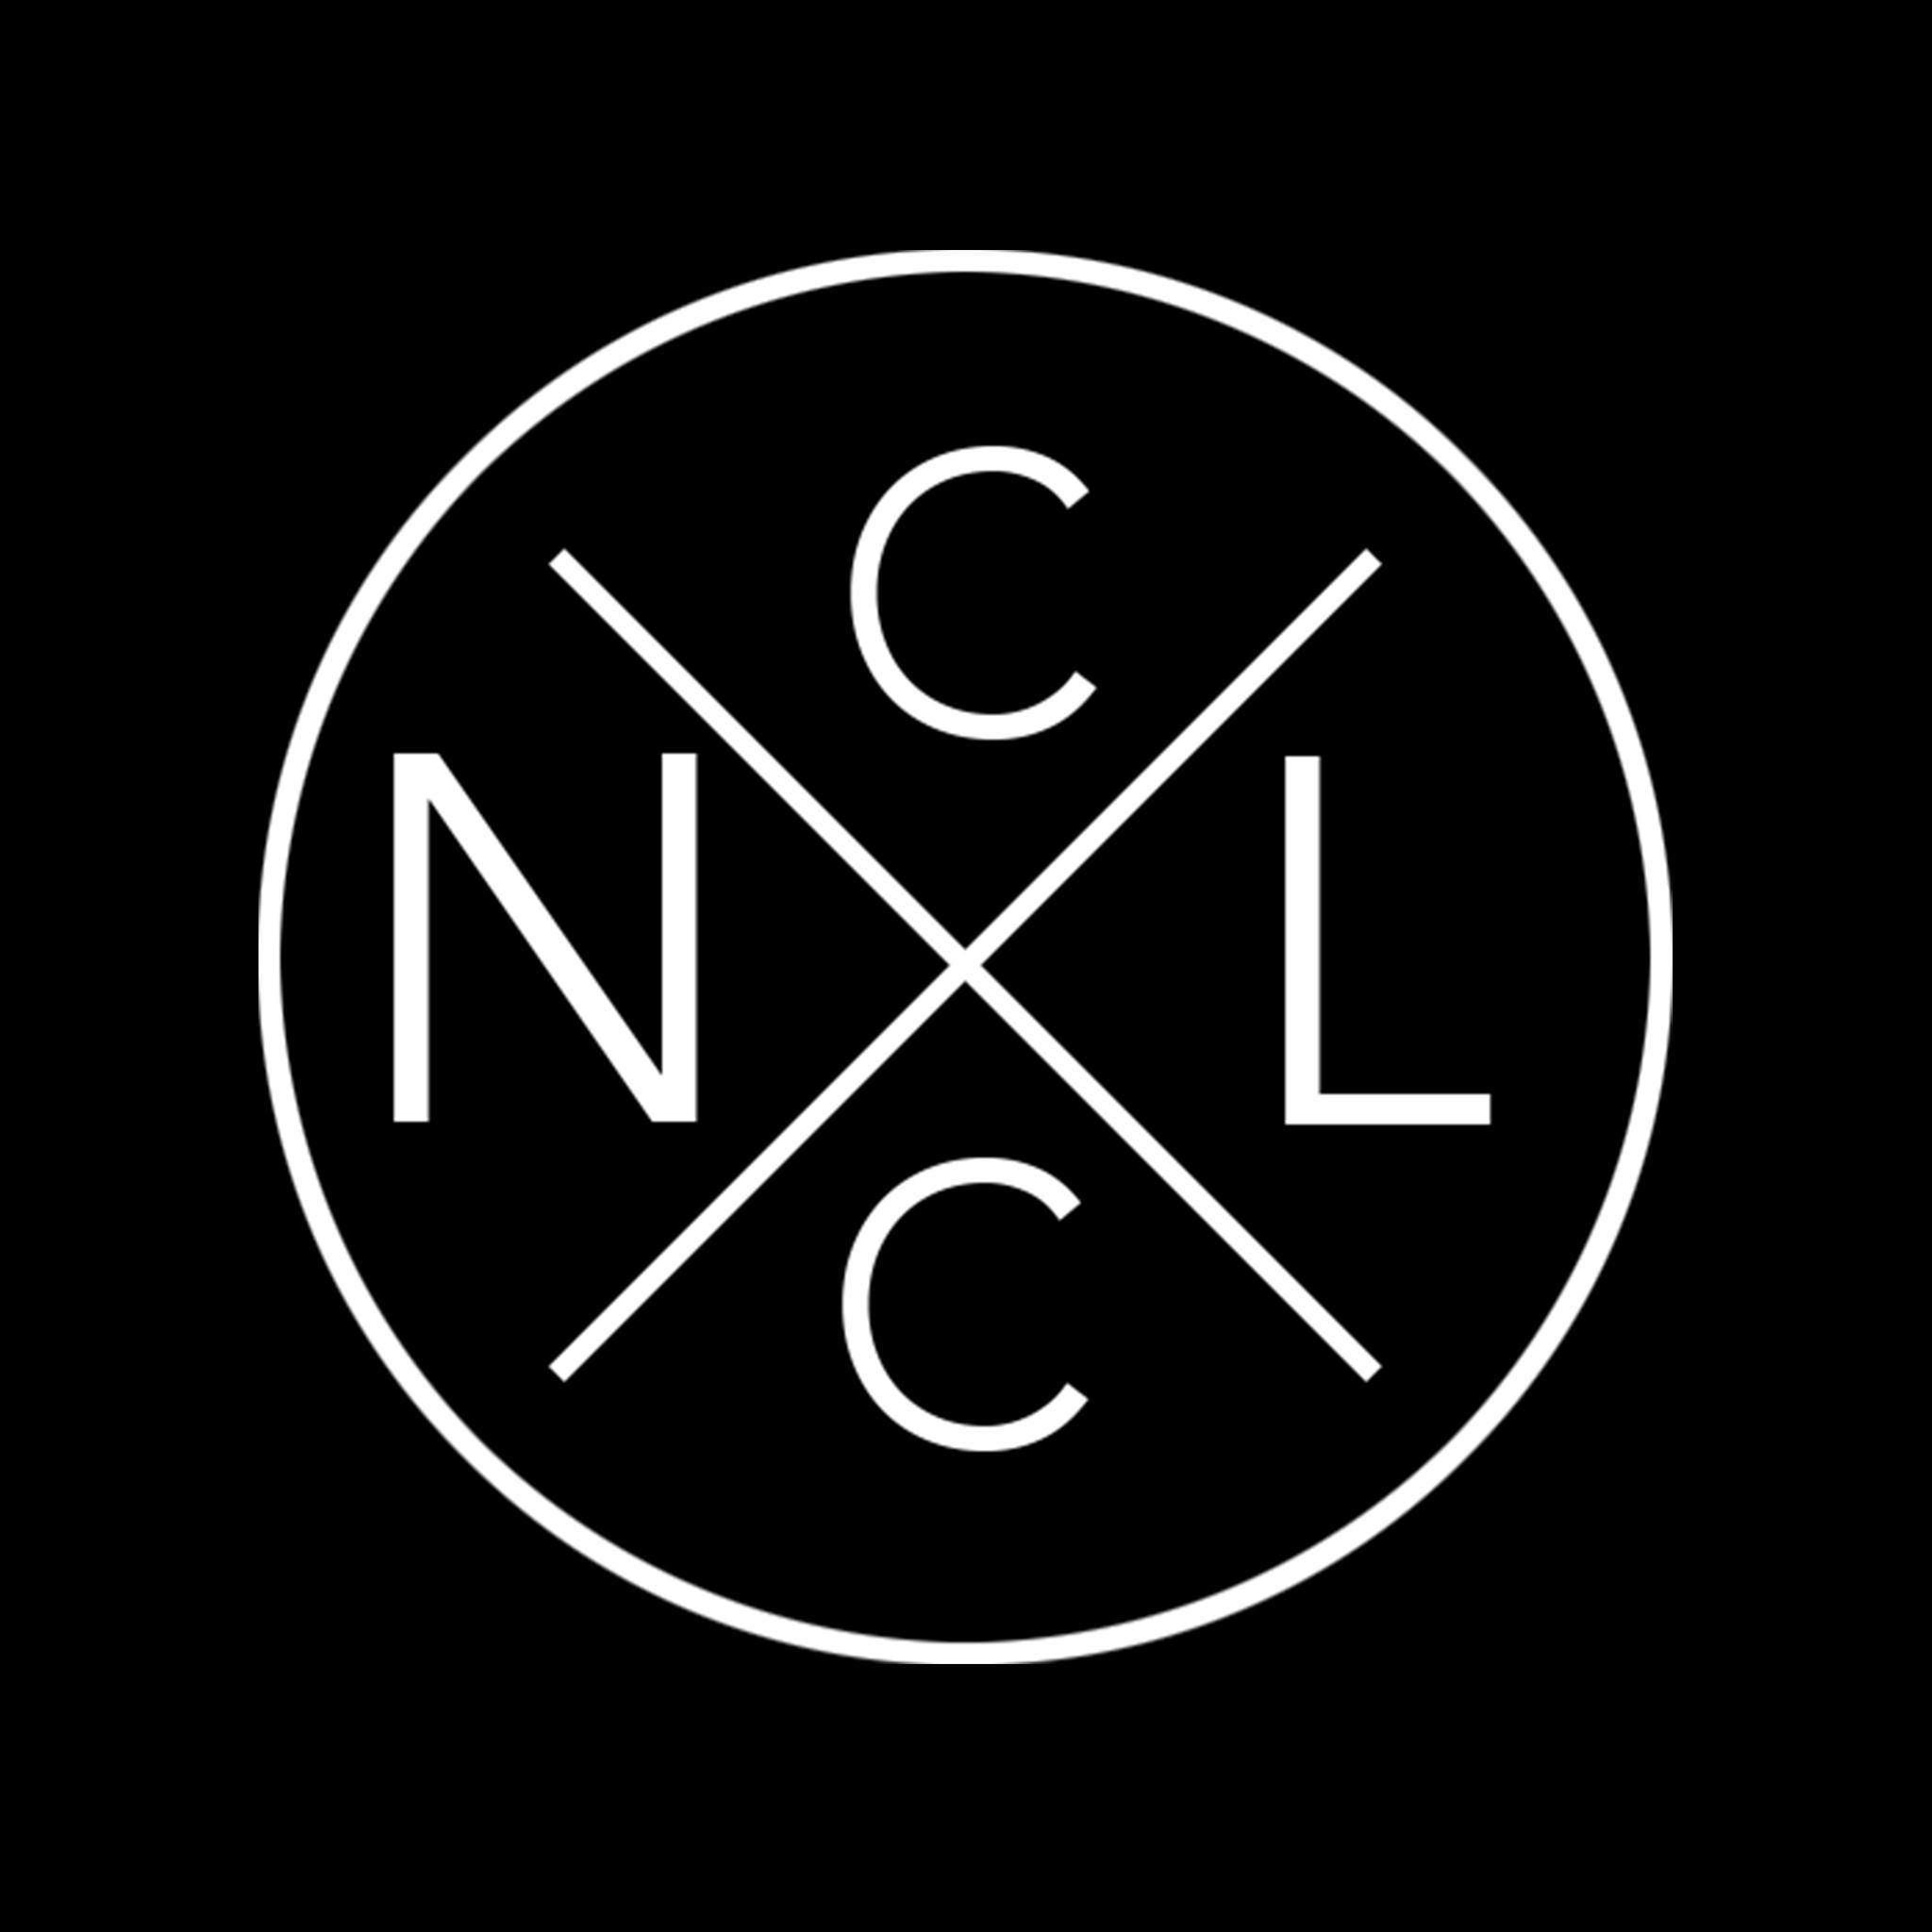 Nlcc icon